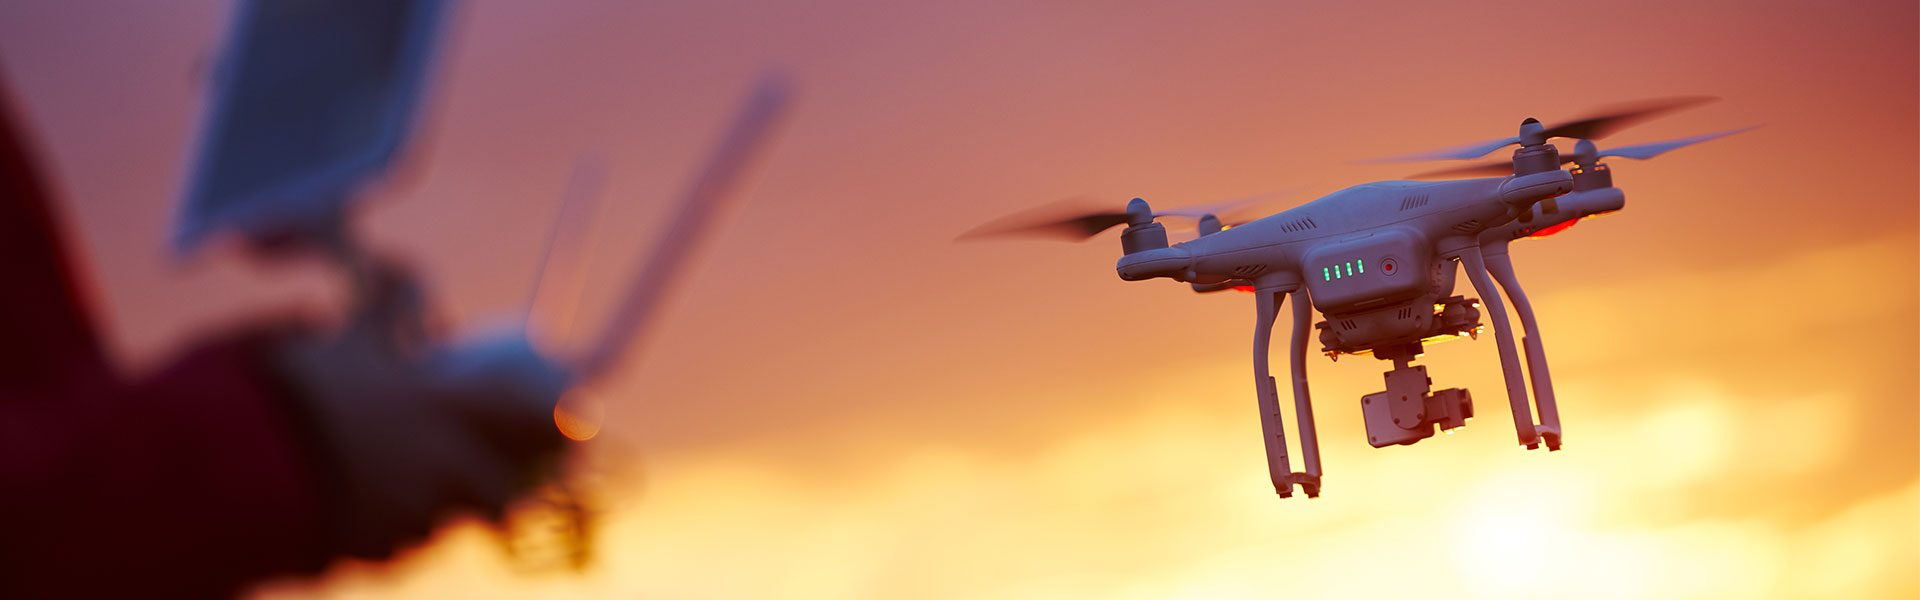 DRONES & ROBOTICS -